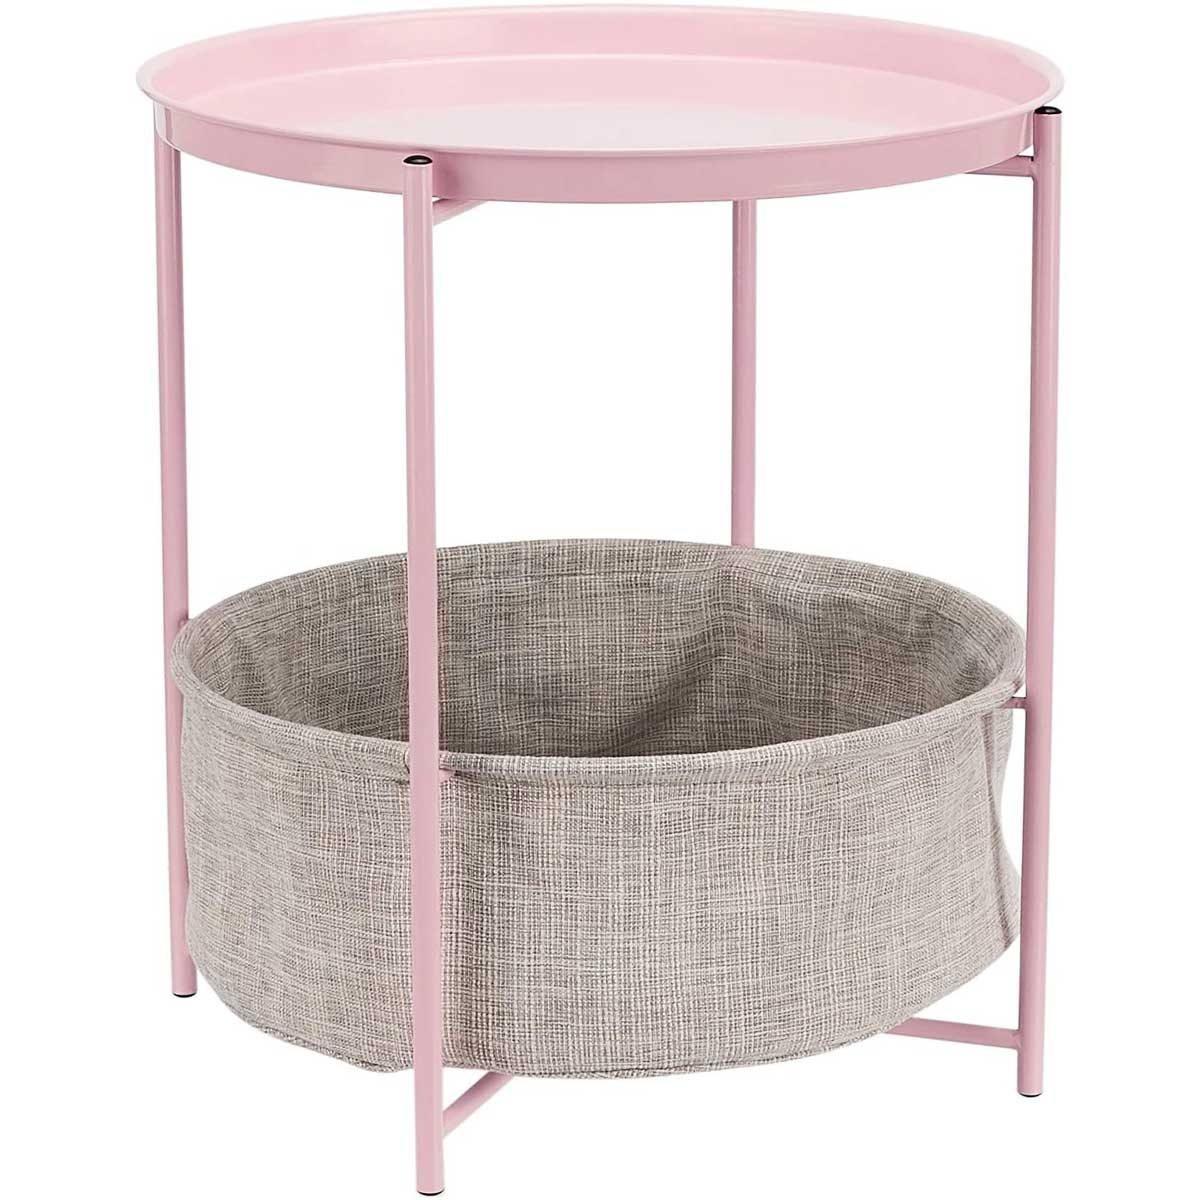 Pink round nightstand